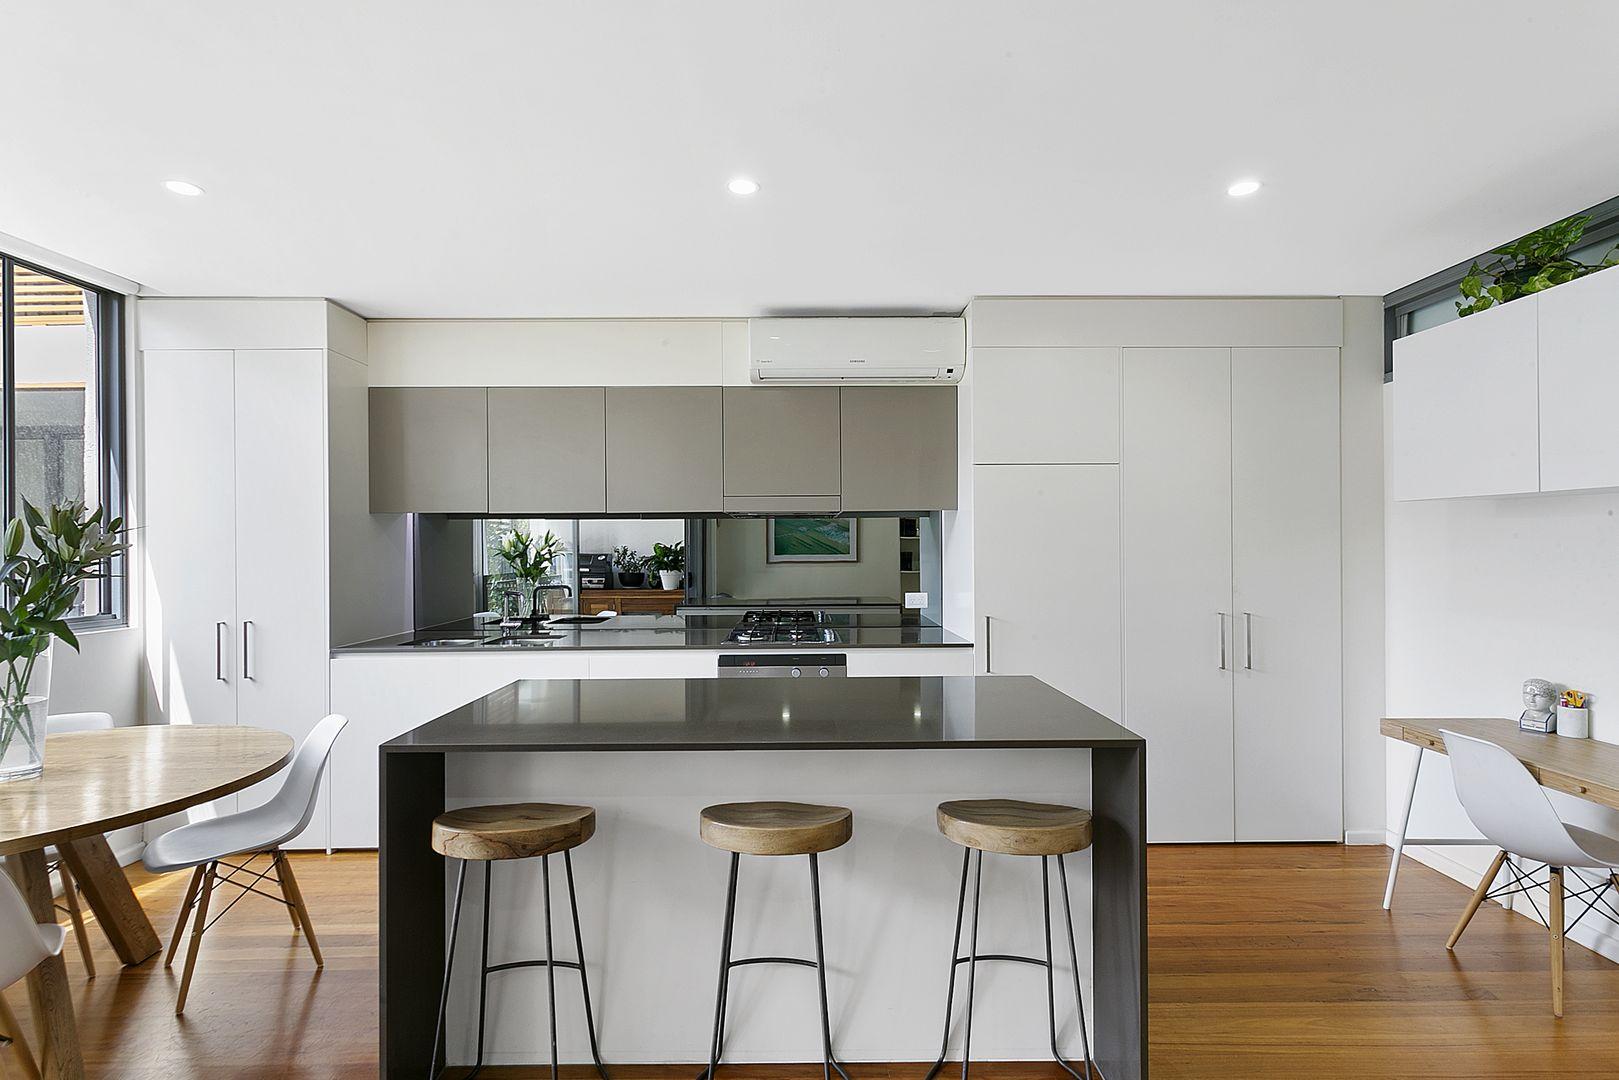 203/9-15 Ascot Street, Kensington NSW 2033, Image 0